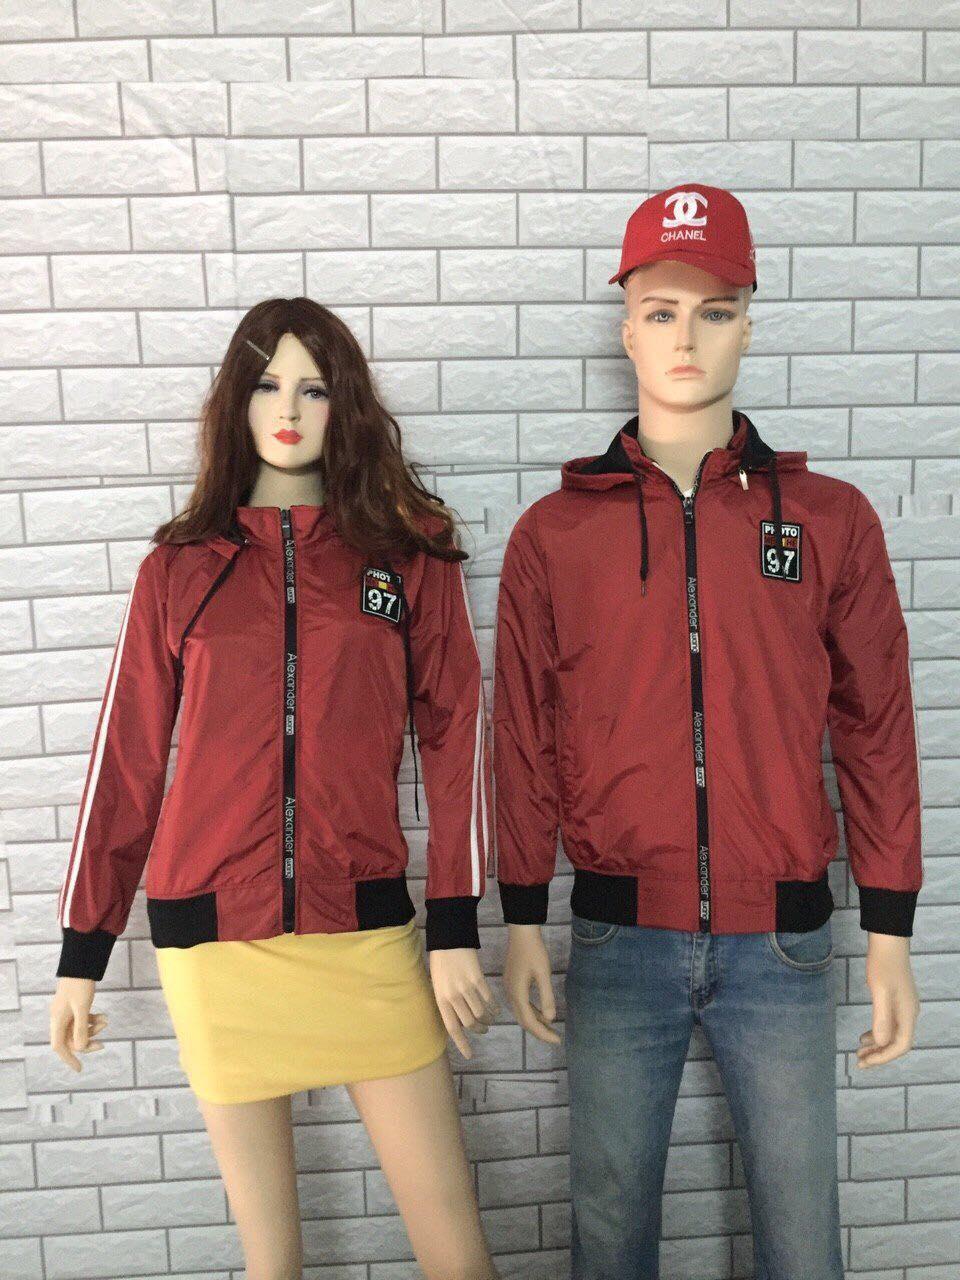 Áo khoác adidas đỏ